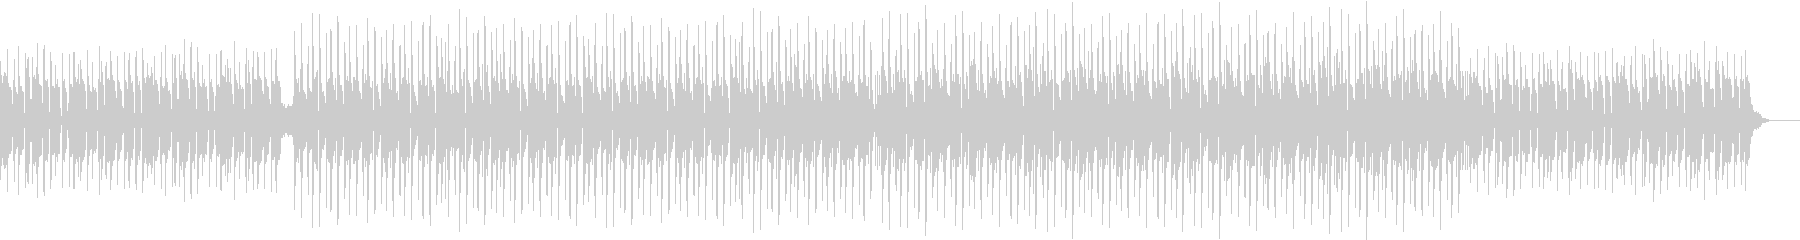 TikTokの某曲っぽいトロピカルハウスの未再生の波形